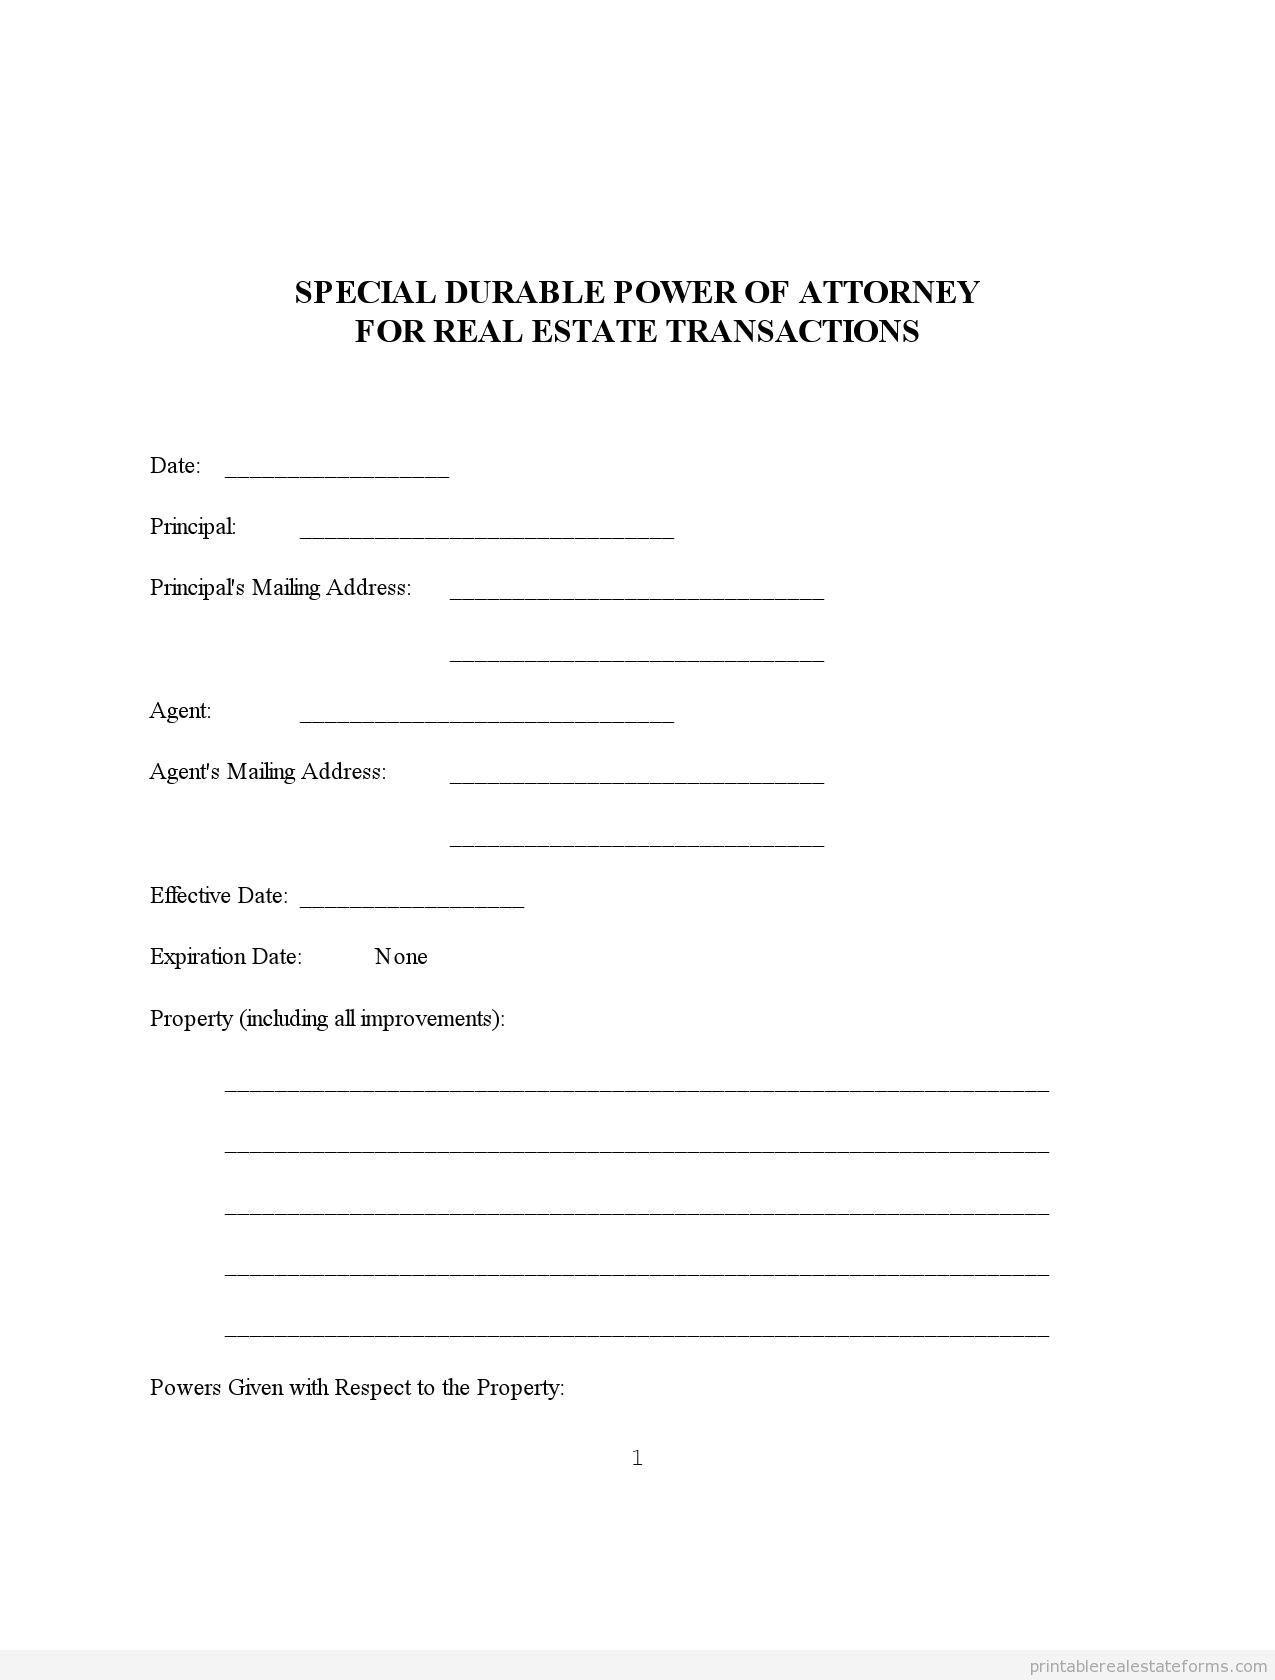 Sample Printable Powerofattorney 1 Form Real Estate Forms Legal